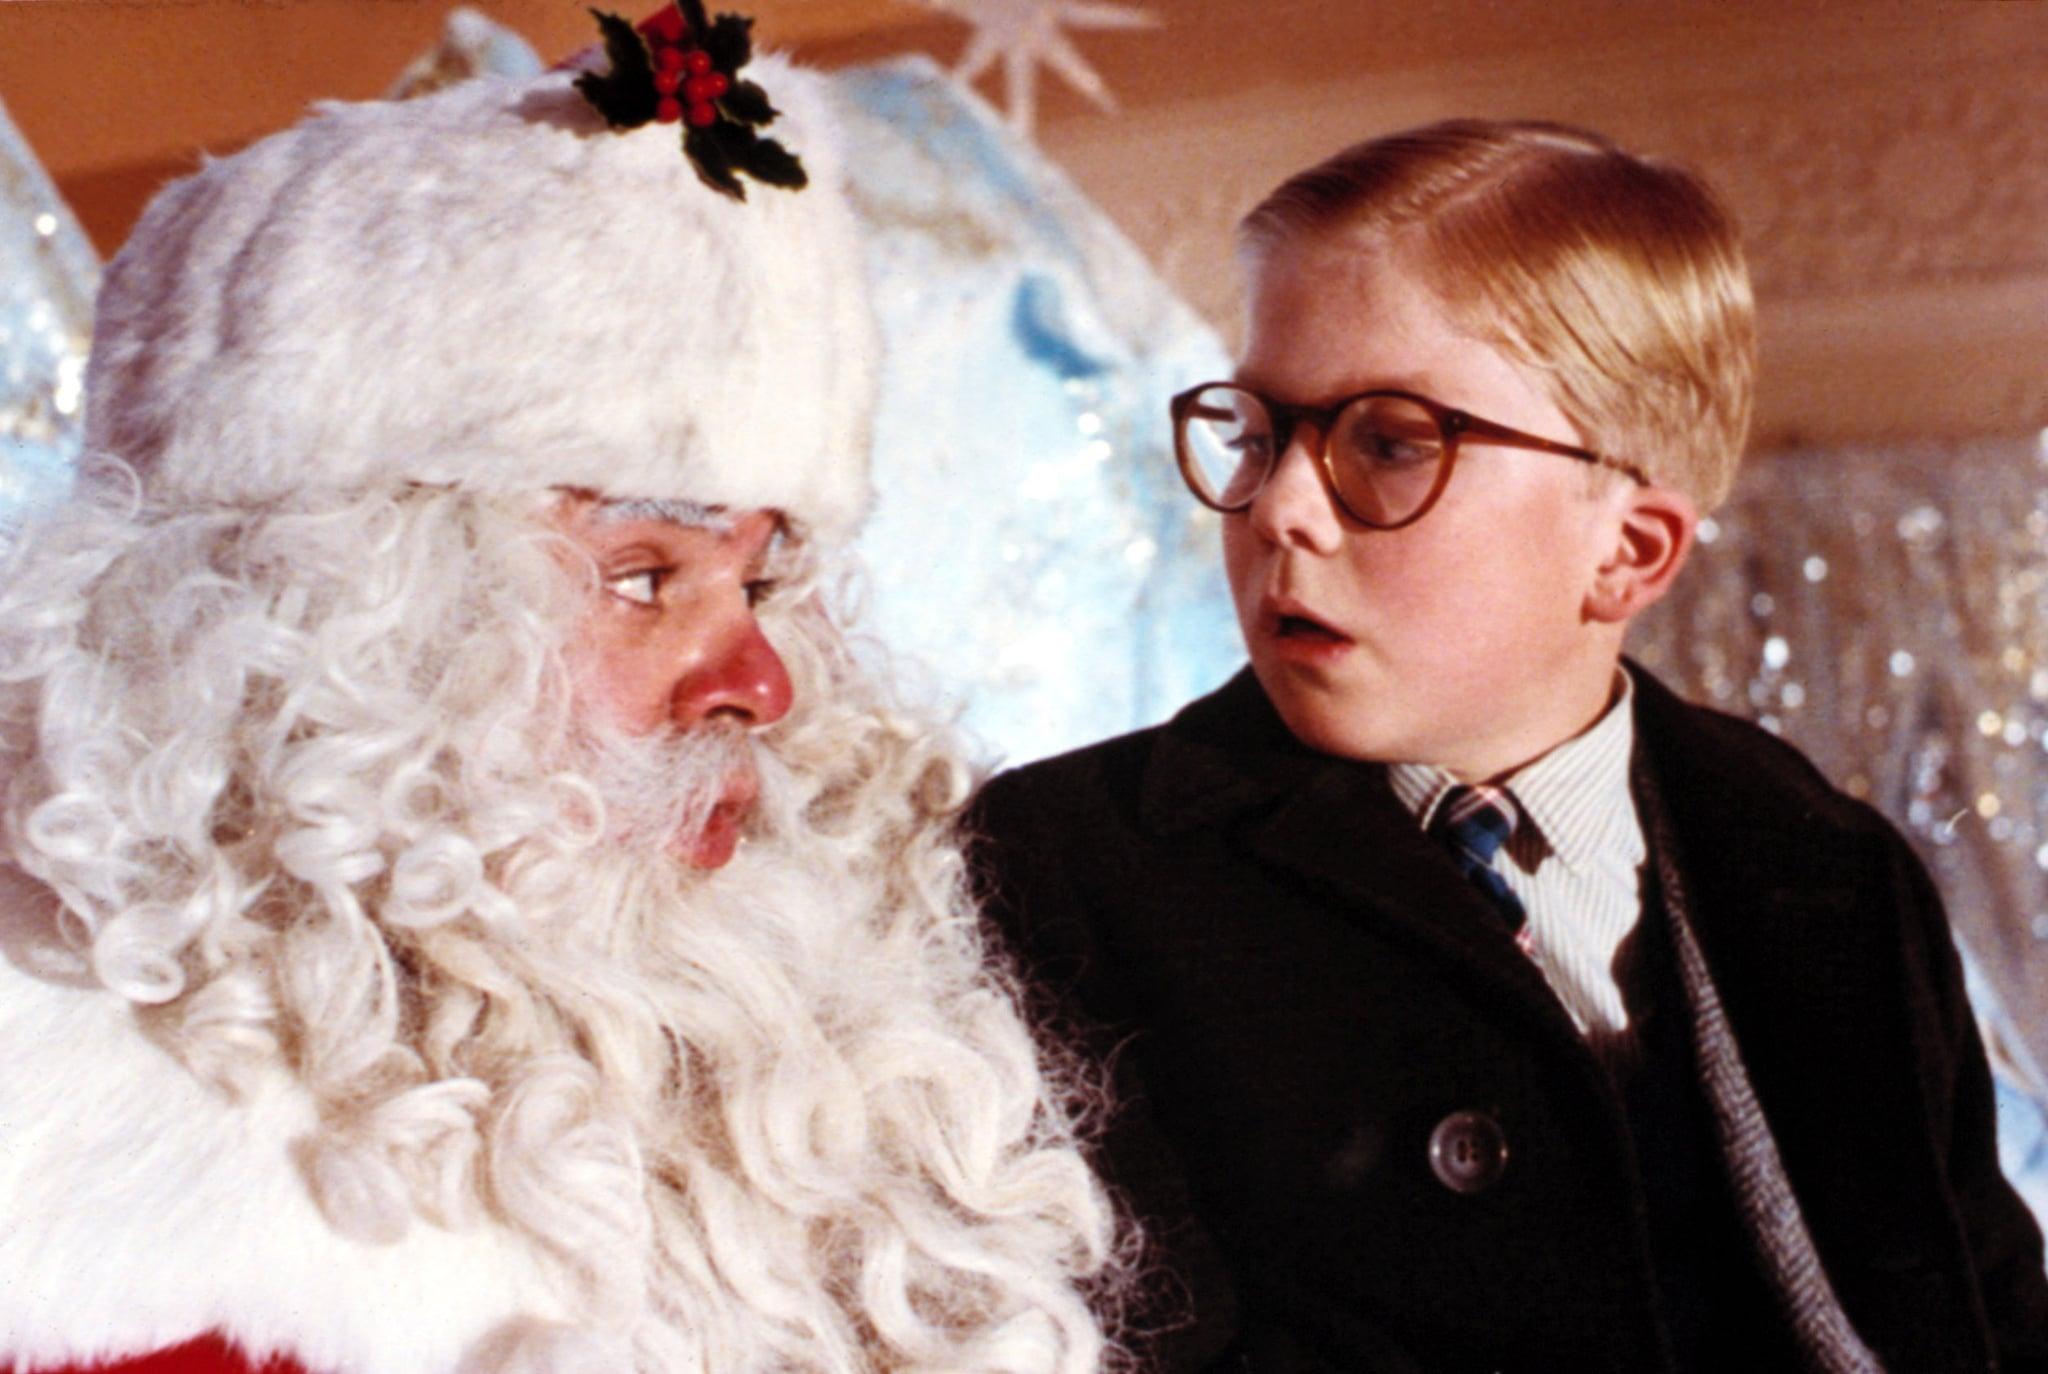 A CHRISTMAS STORY, Peter Billingsley, Jeff Gillen, 1983.